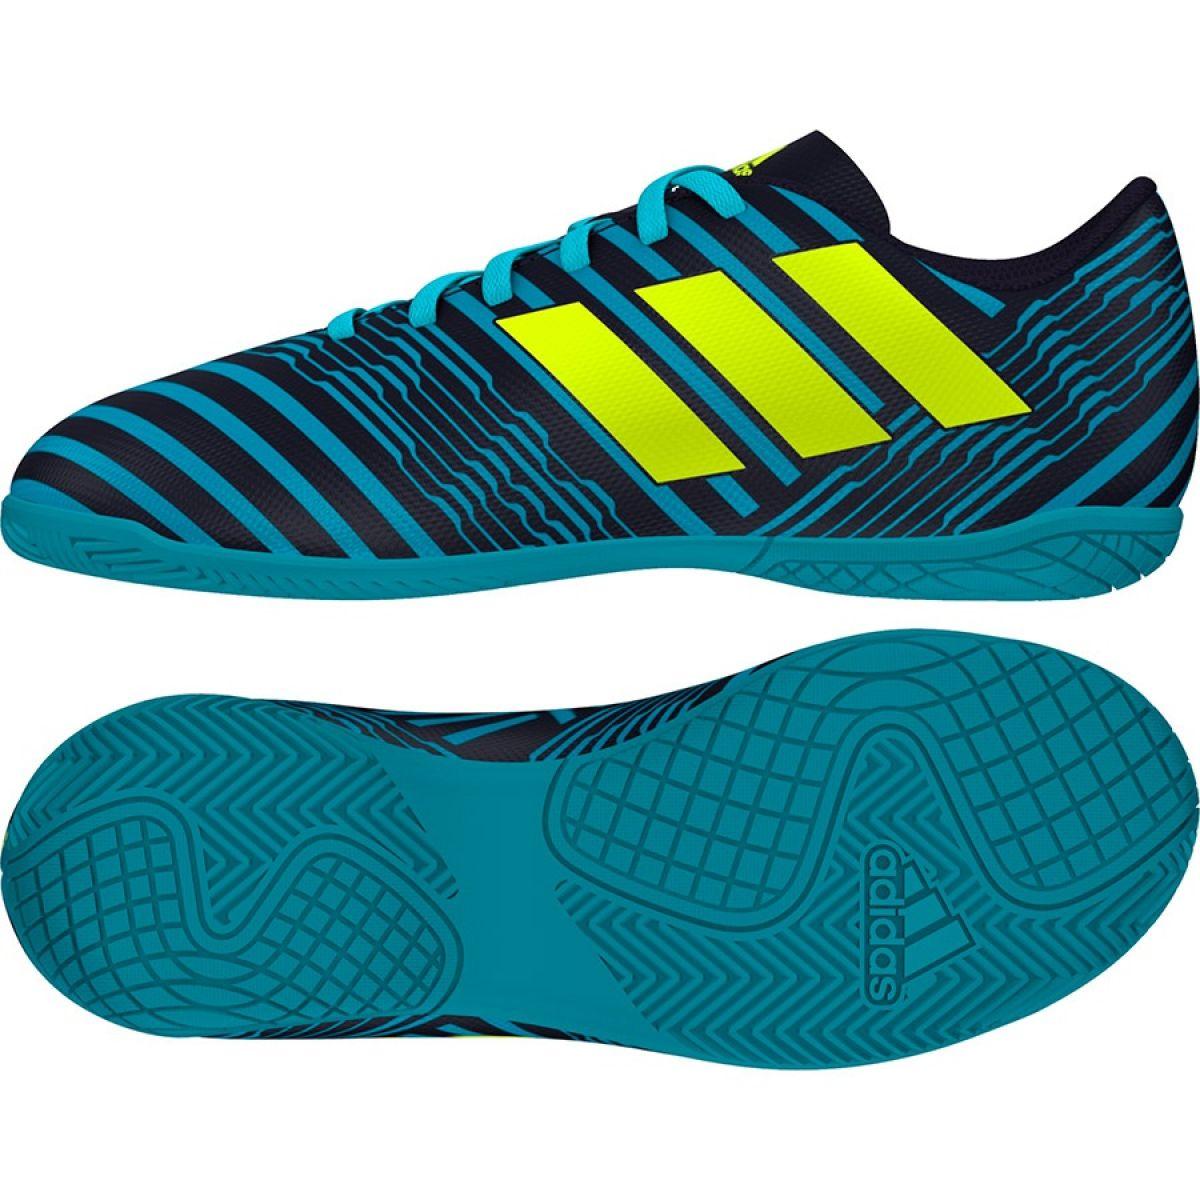 387385d3ffe7a Buty halowe adidas Nemeziz 17.4 Jr S82465 28 - 7199218921 ...